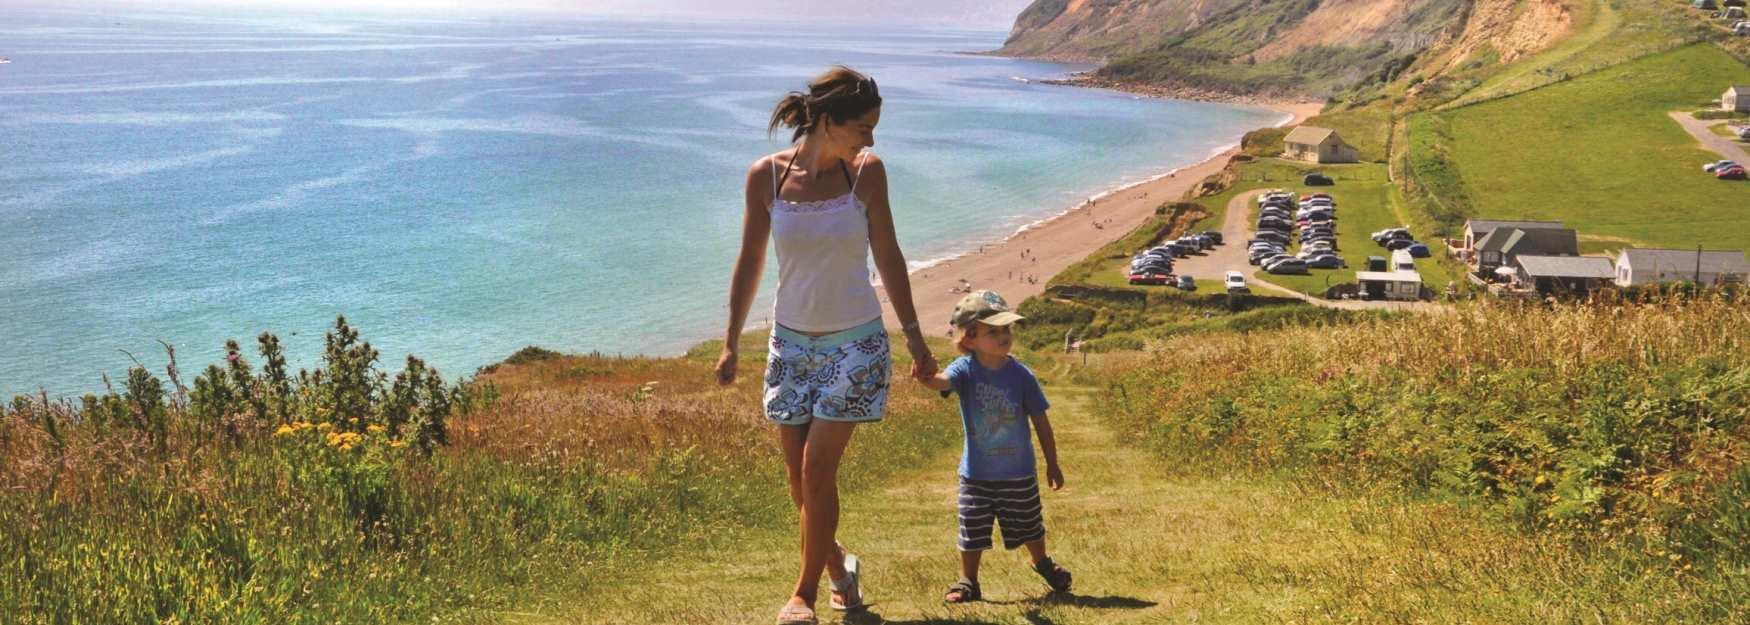 Explore the stunning Dorset coast